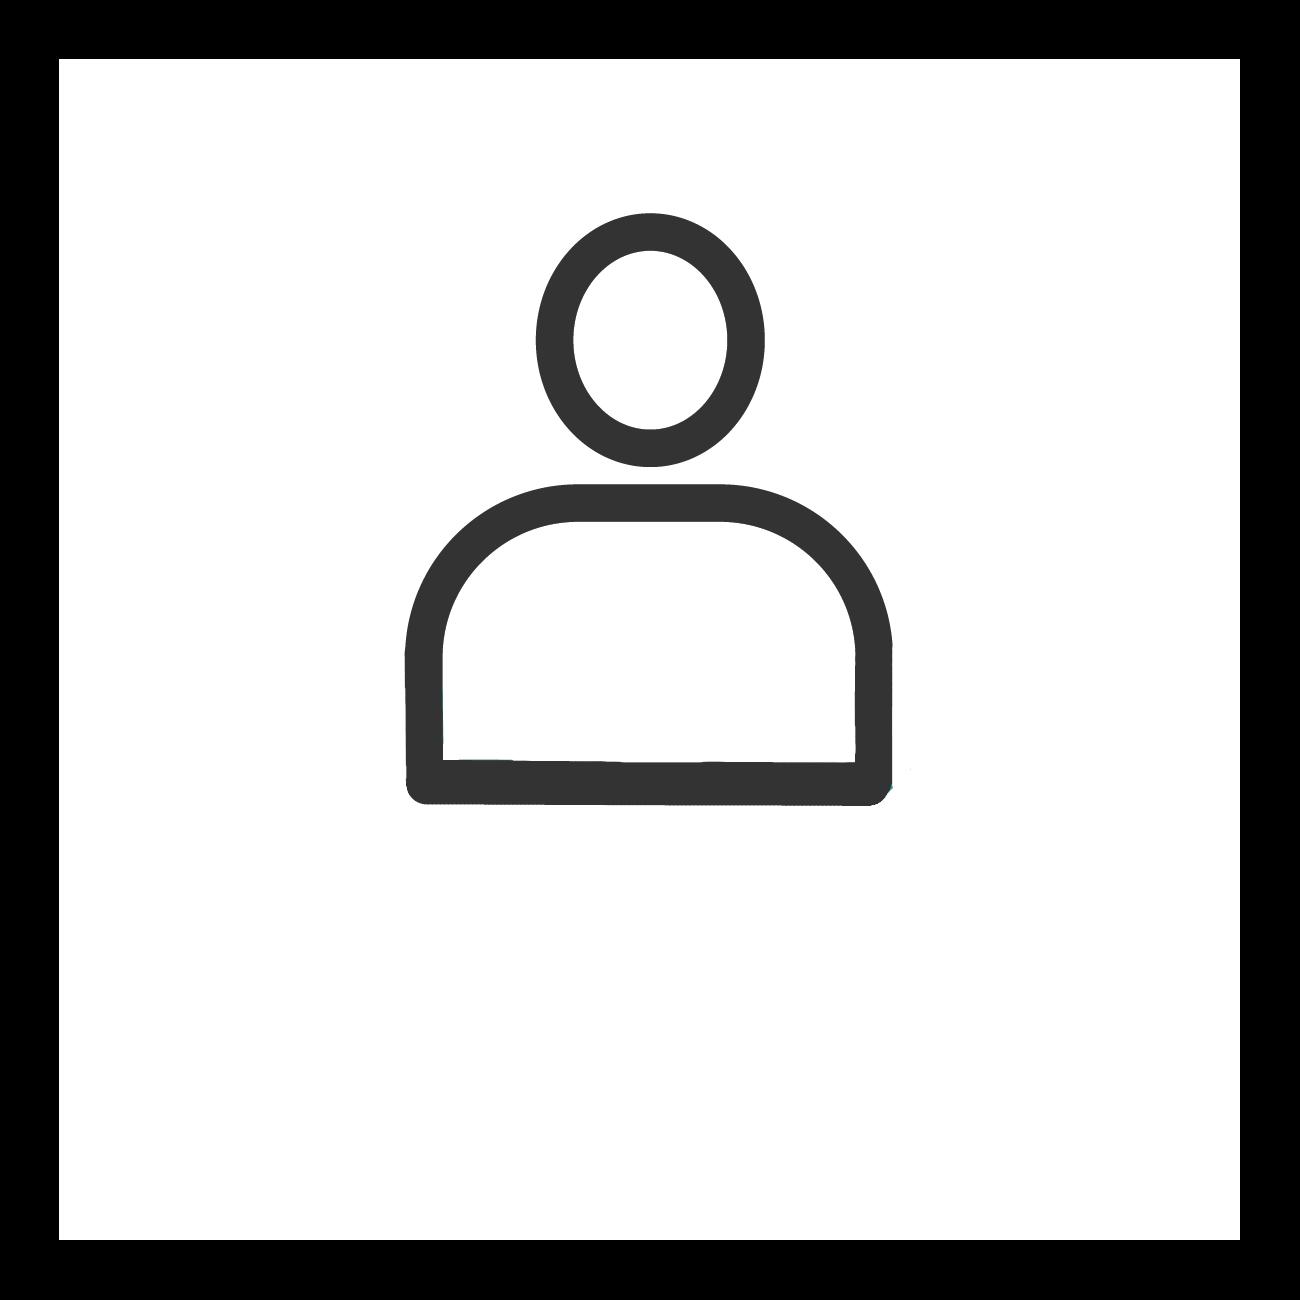 About a job logo